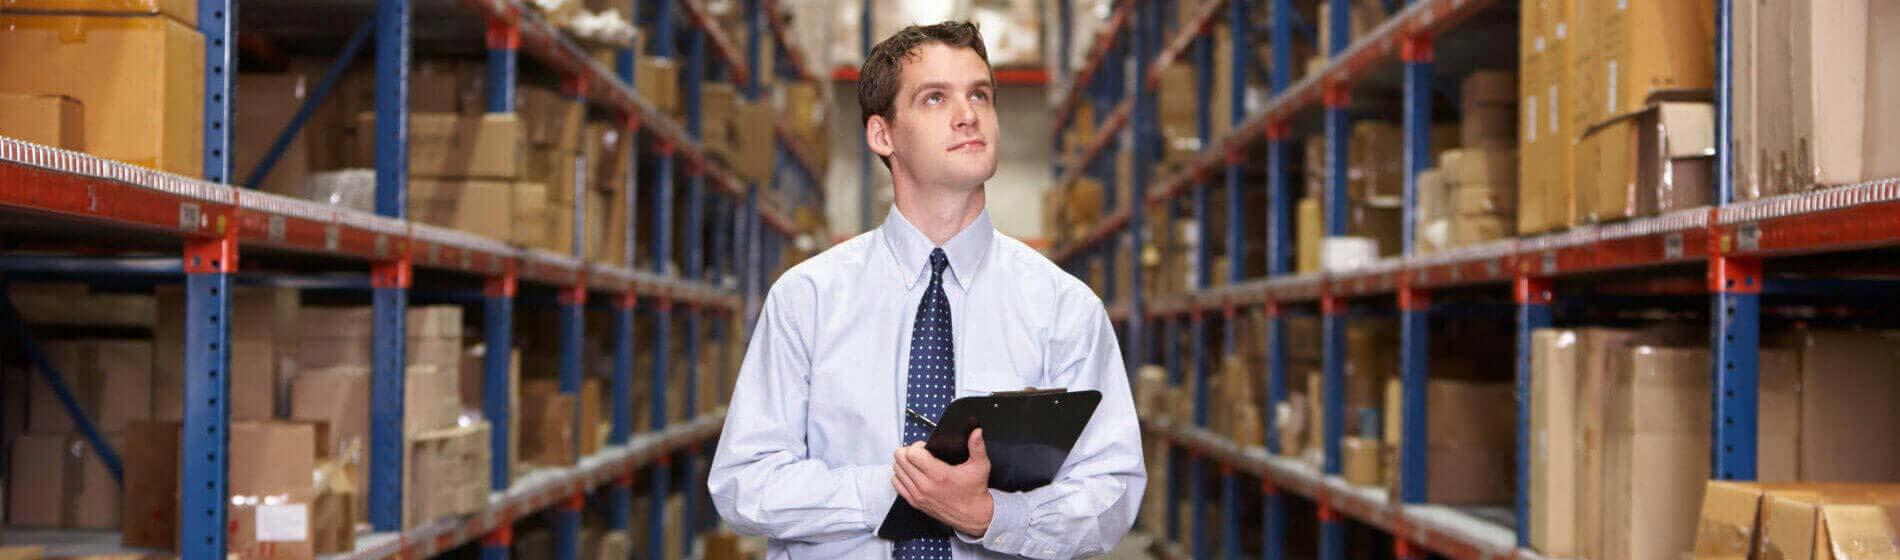 Warehouse_Man_gement